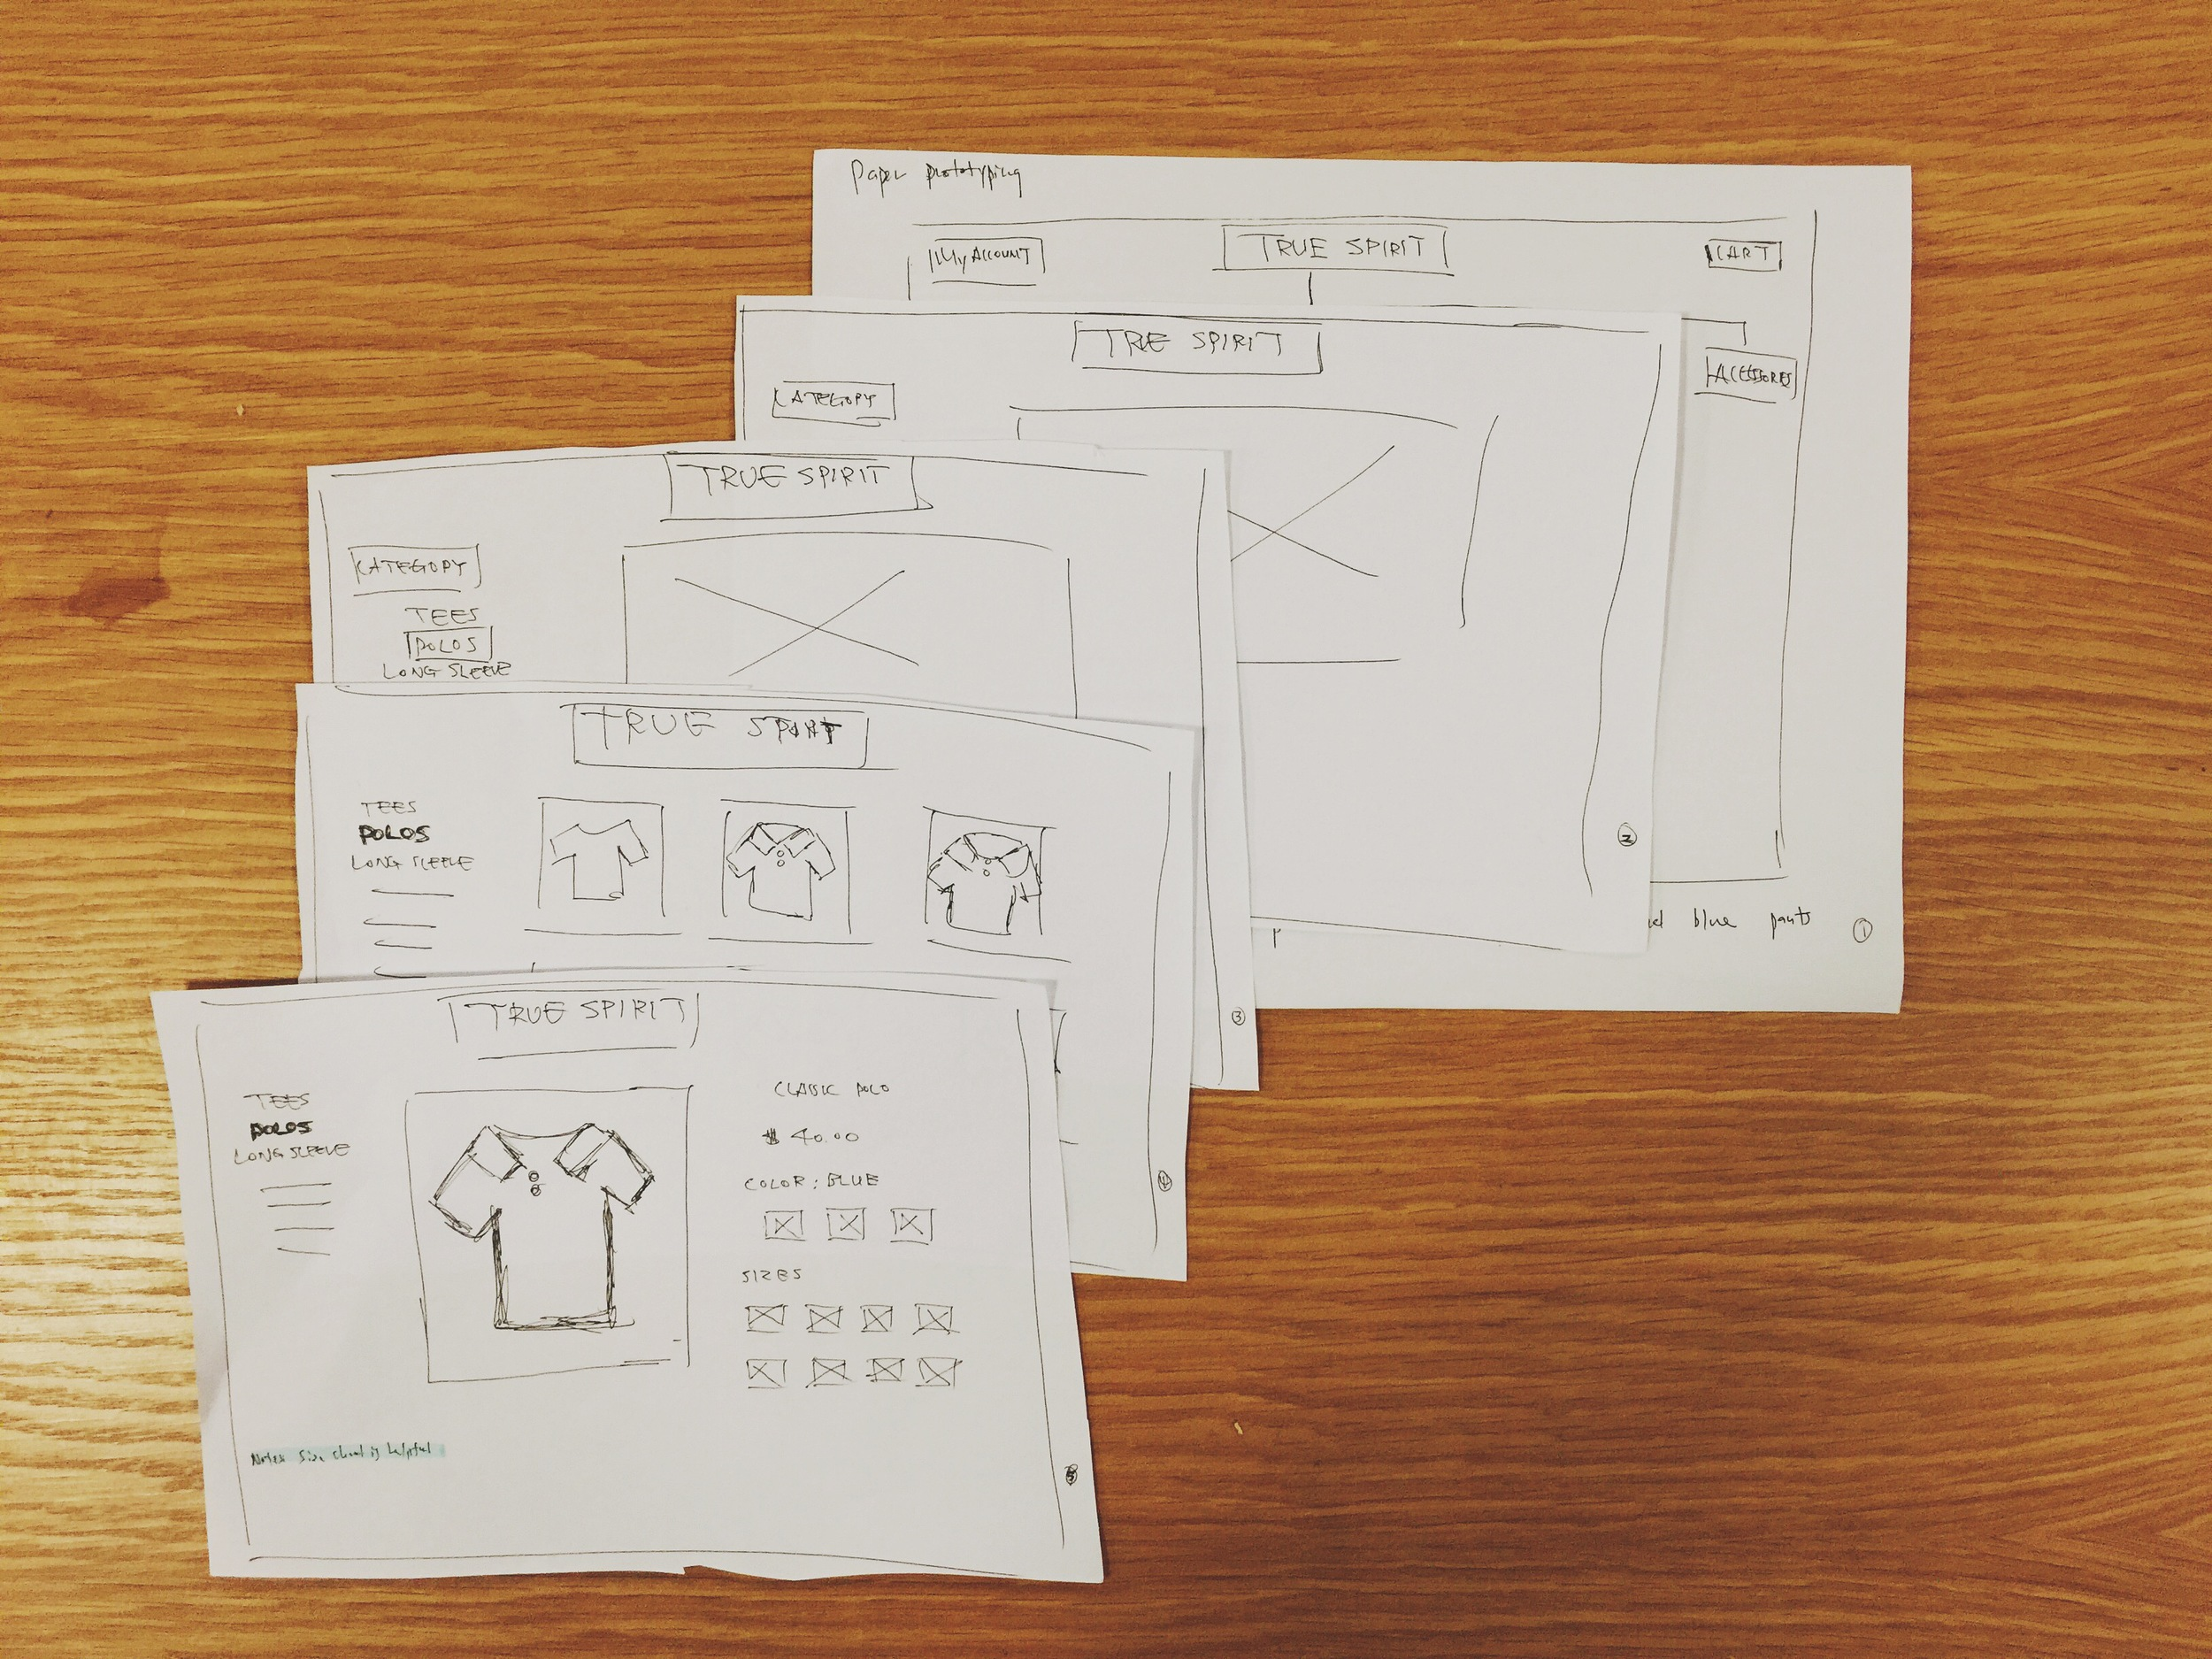 Simple paper prototype